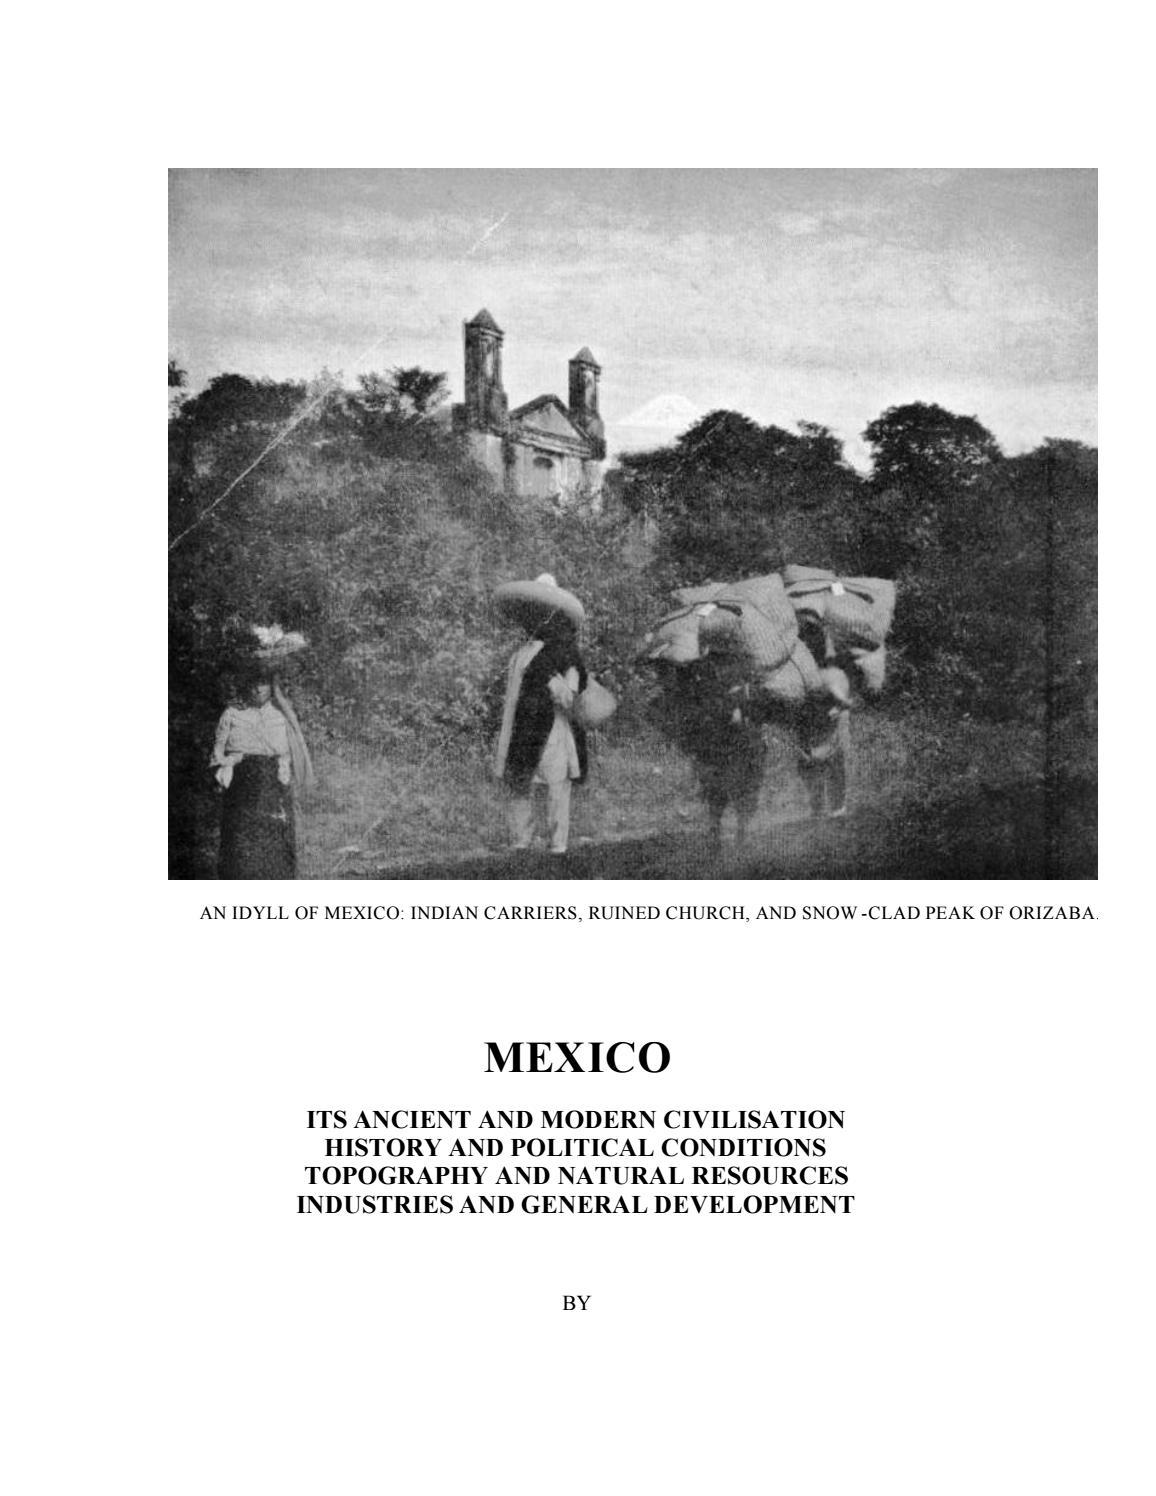 21 LIBRO Mexico en 1909 by MANUEL HUMBERTO GONZALEZ RAMOS - issuu 466e4f8ce5a8